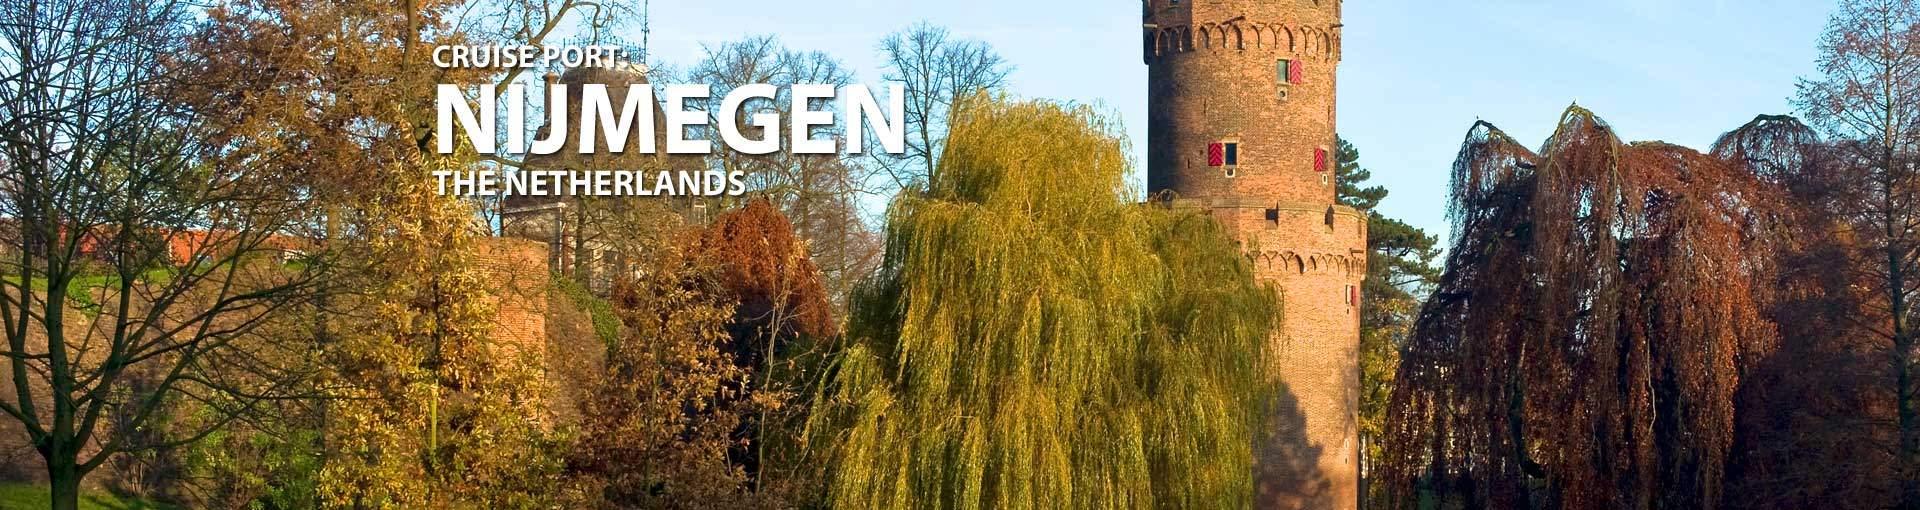 Cruises to Nijmegen, The Netherlands